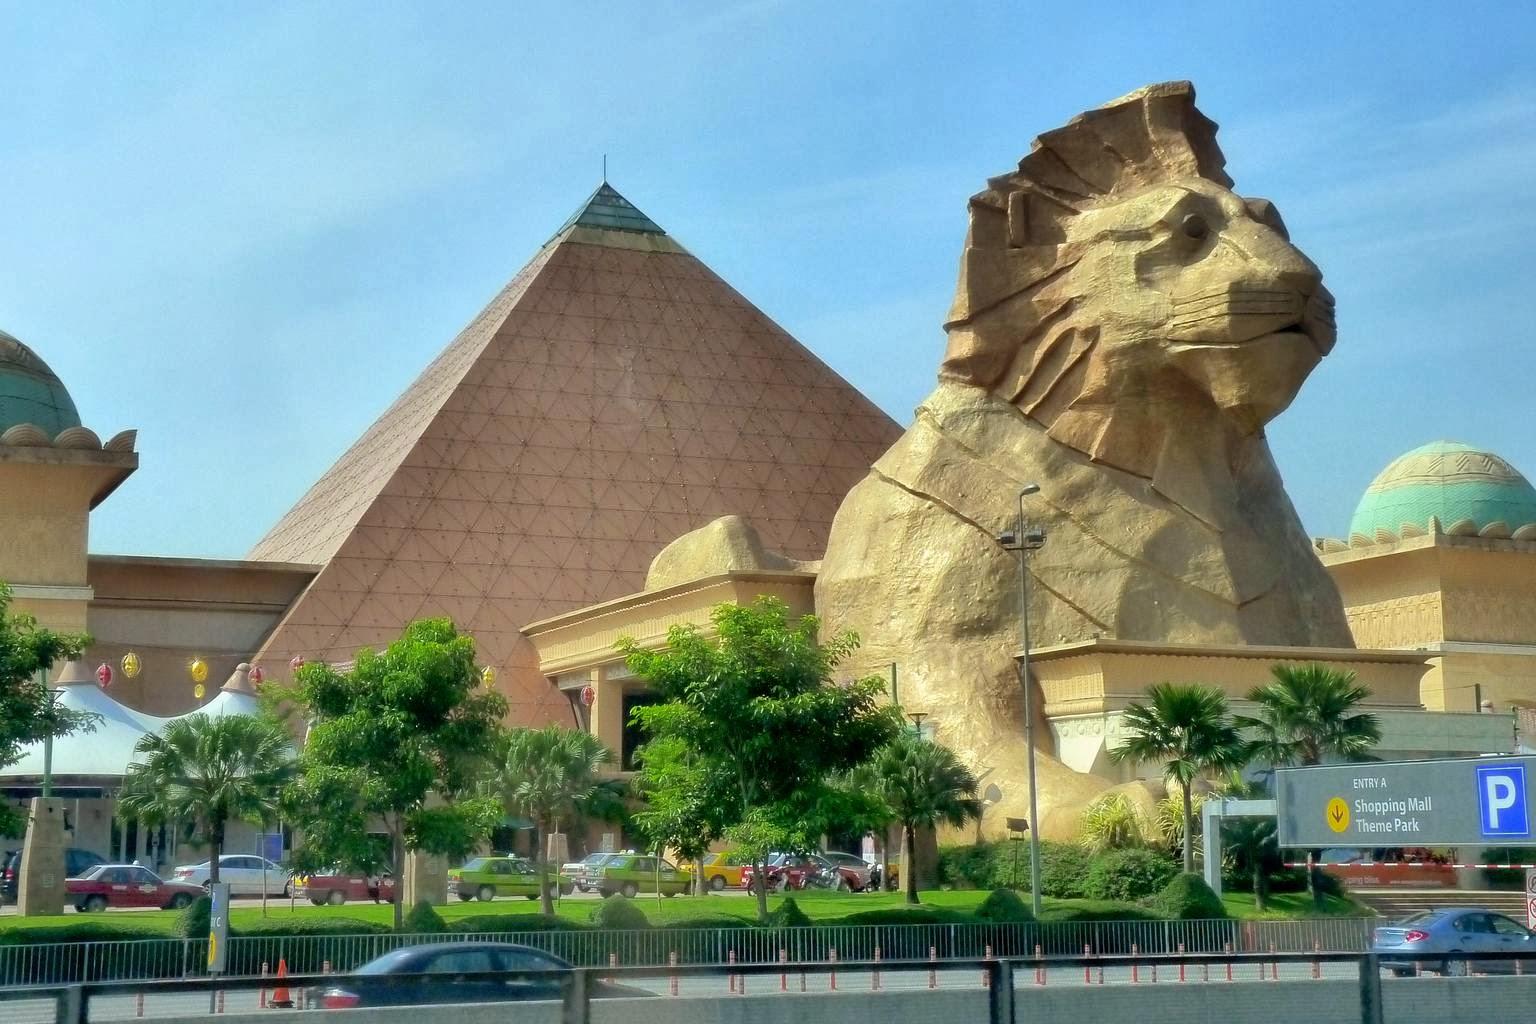 sunway pyramid Tara – thailand escort tara – thailand escort name: tara age: 23 years body: 160cm 55kg 36c 26 36 nationality: thailand service: french kiss, blow job no condom, doggy style, horse ridding, cathbath.